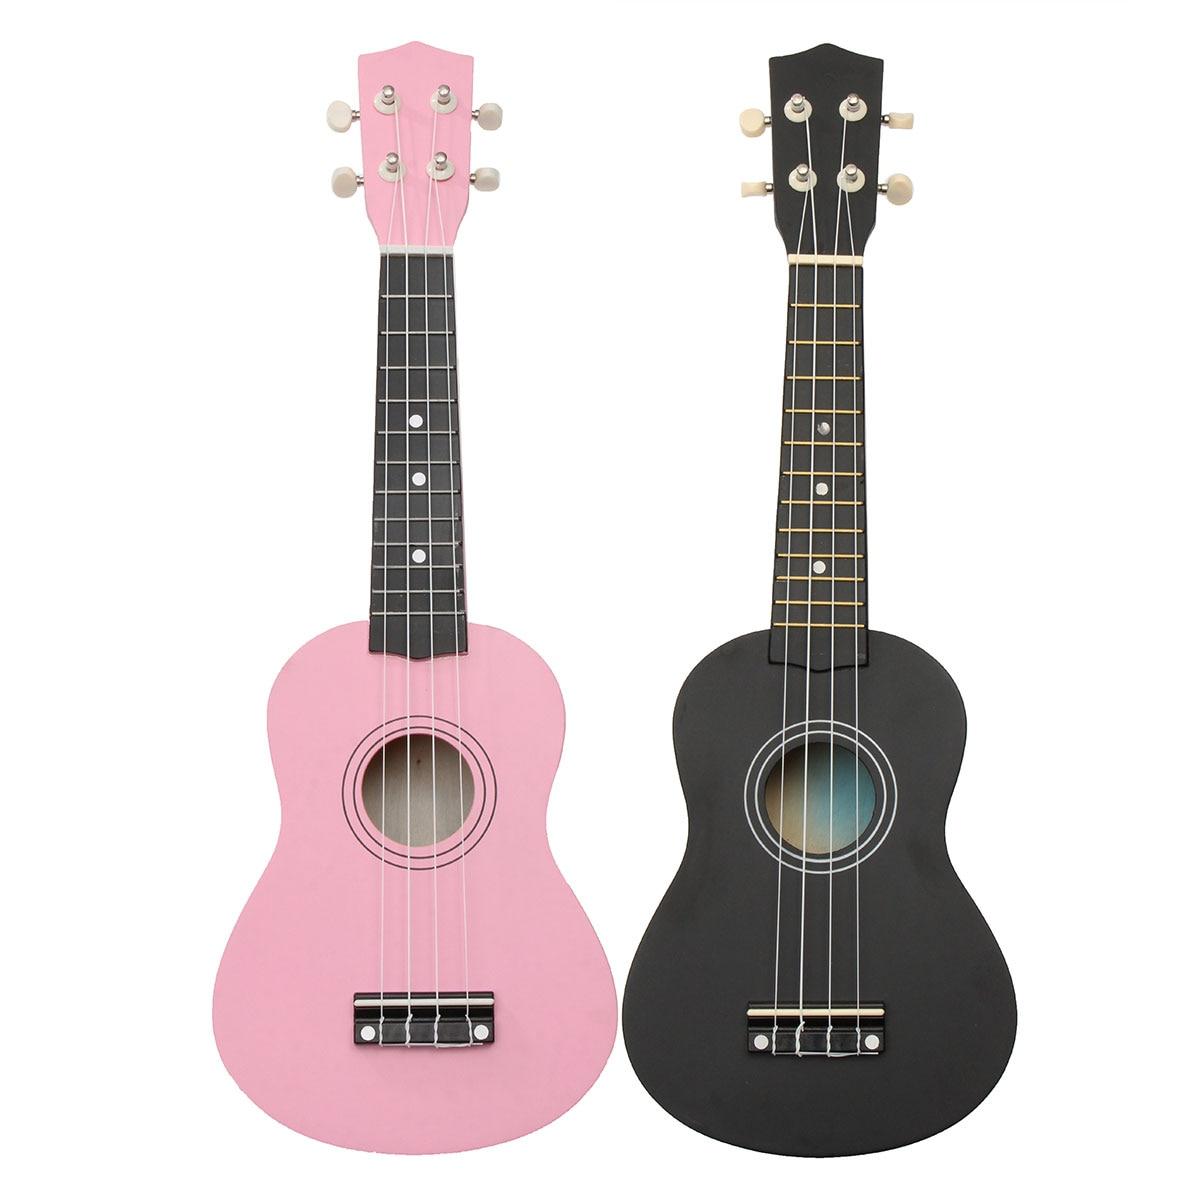 zebra 21 black pink maple basswood soprano ukulele uke nylon 4 strings 12 fret acoustic bass. Black Bedroom Furniture Sets. Home Design Ideas